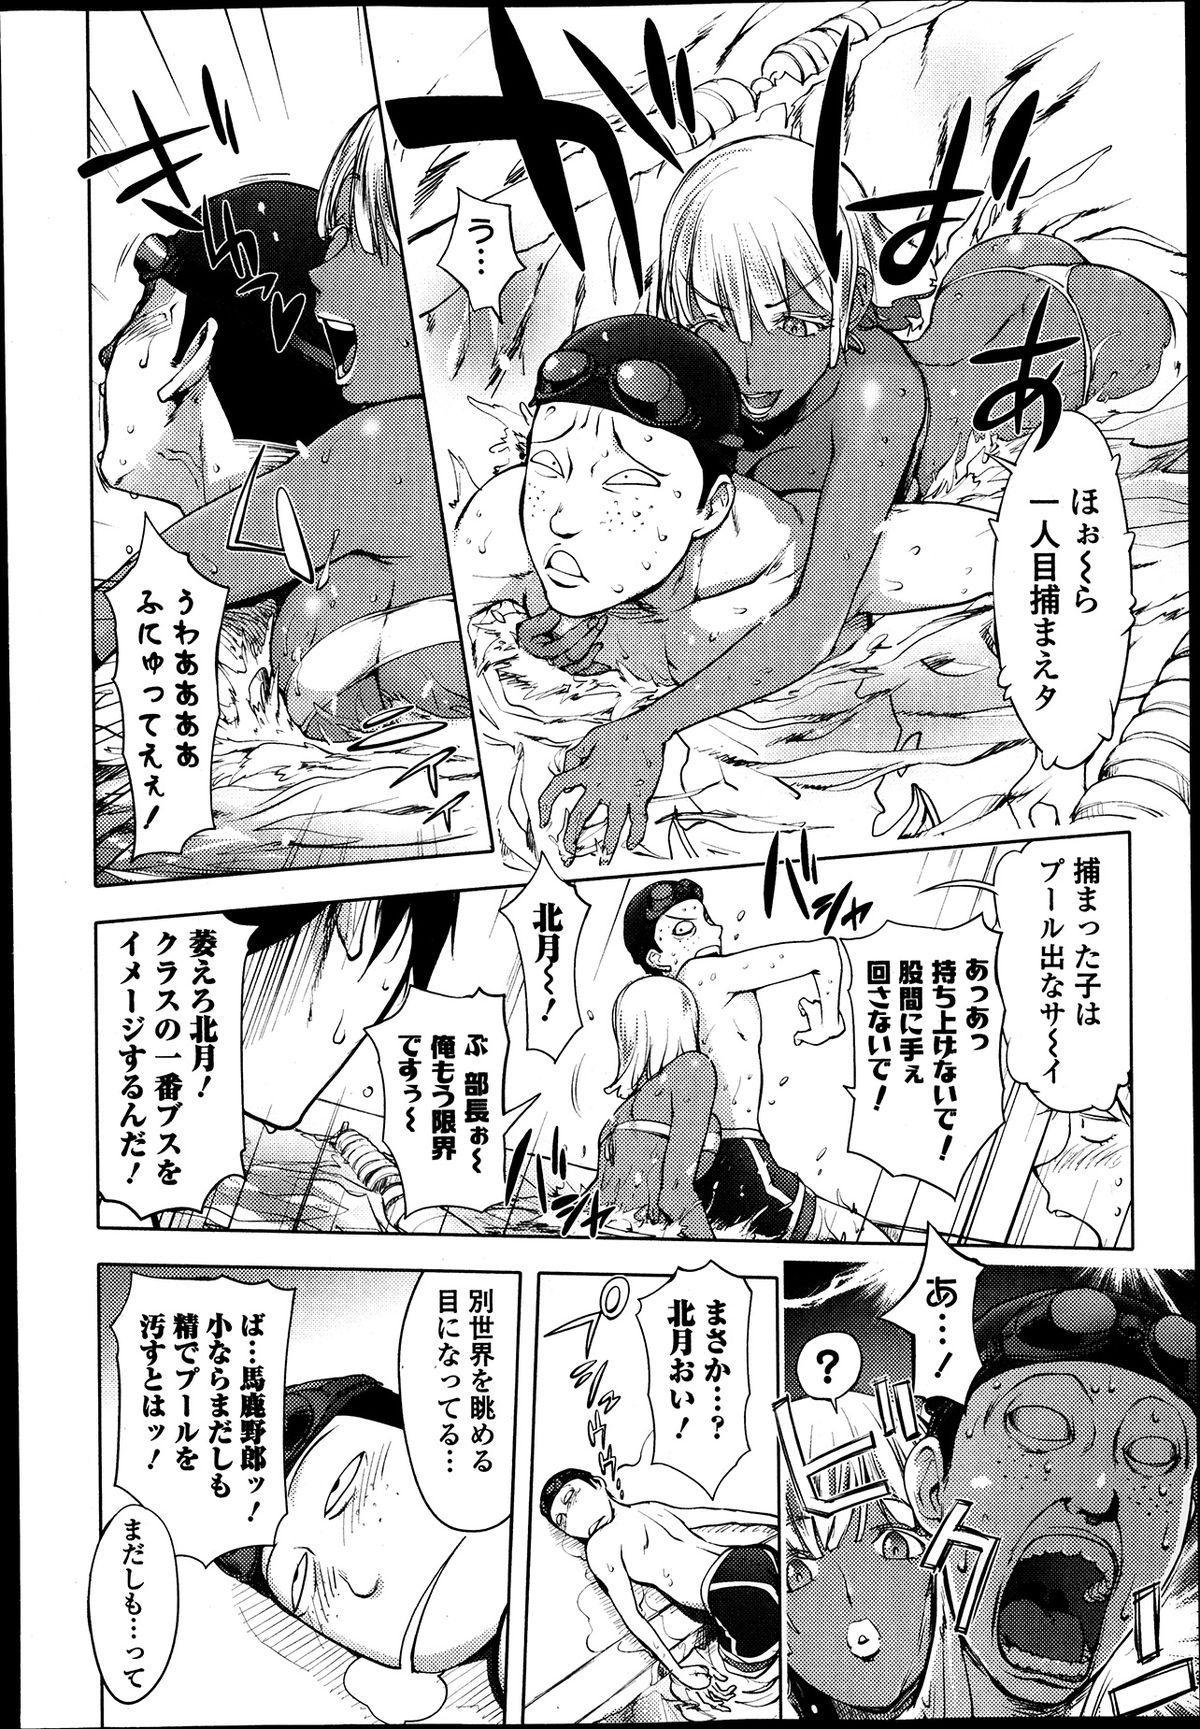 Bishoujo Kakumei KIWAME Road Vol.9 53